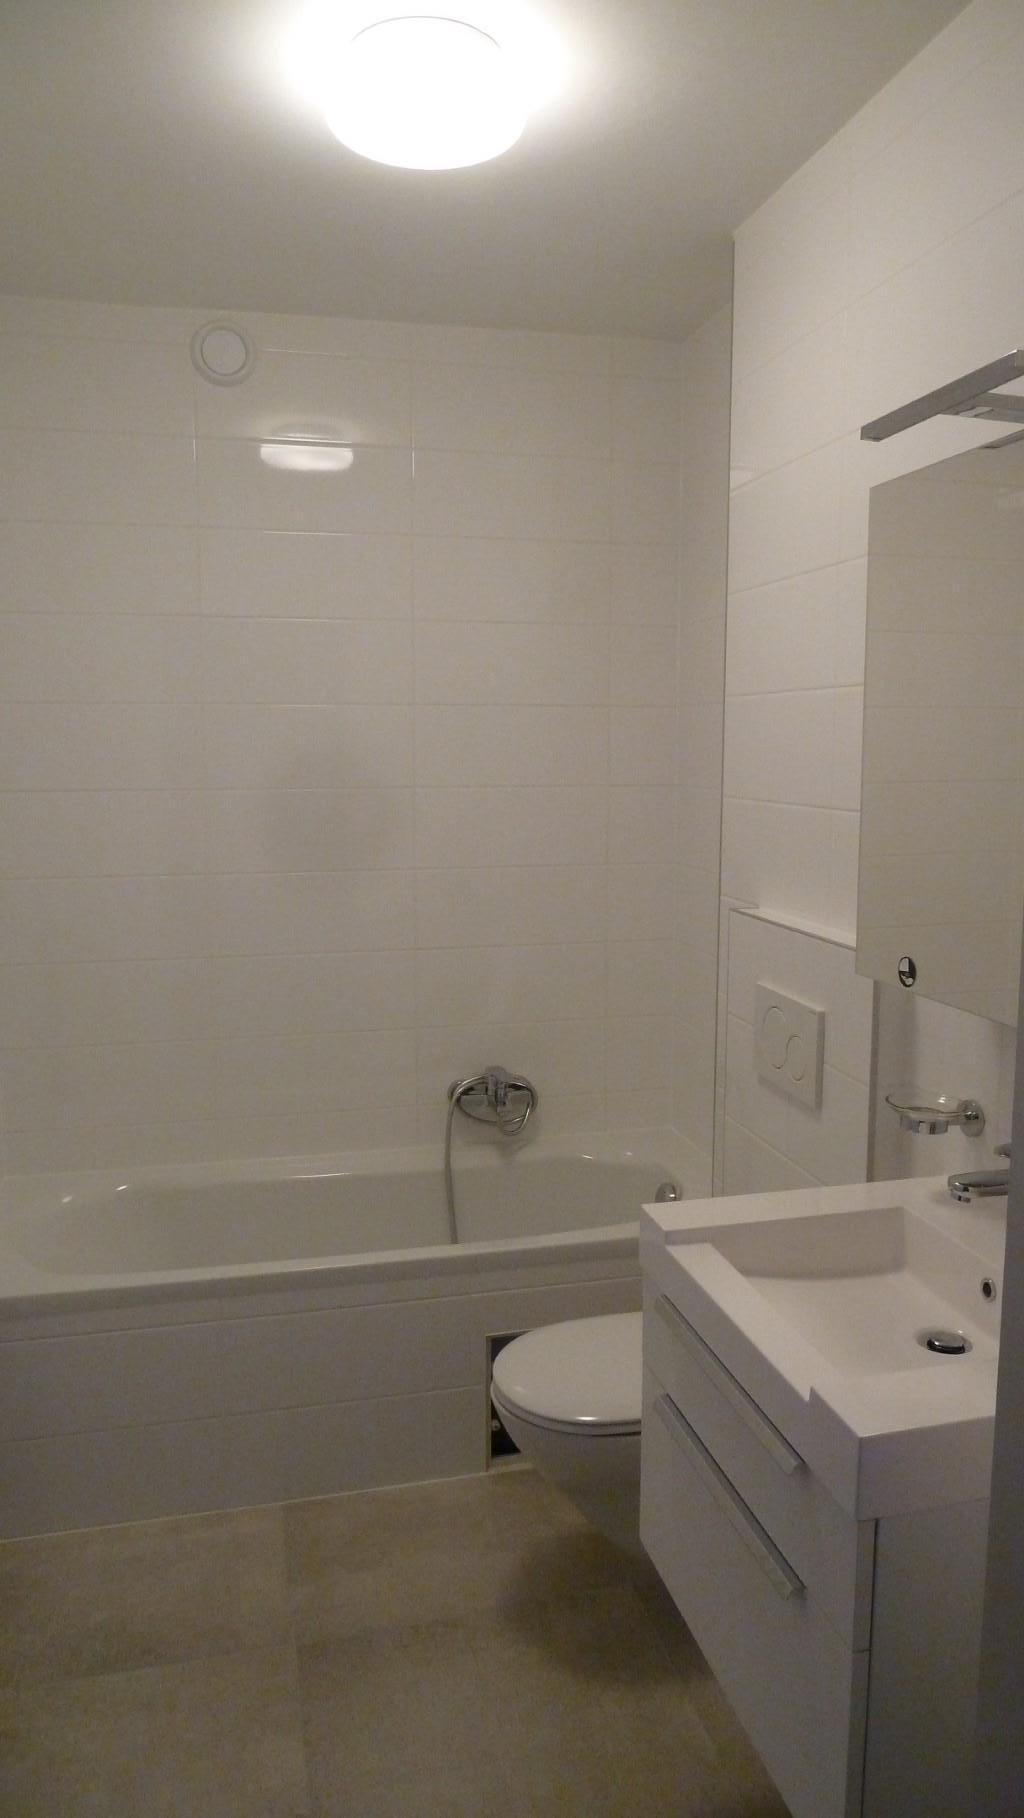 Appartement - Zaventem Sint-Stevens-Woluwe - #3970084-7